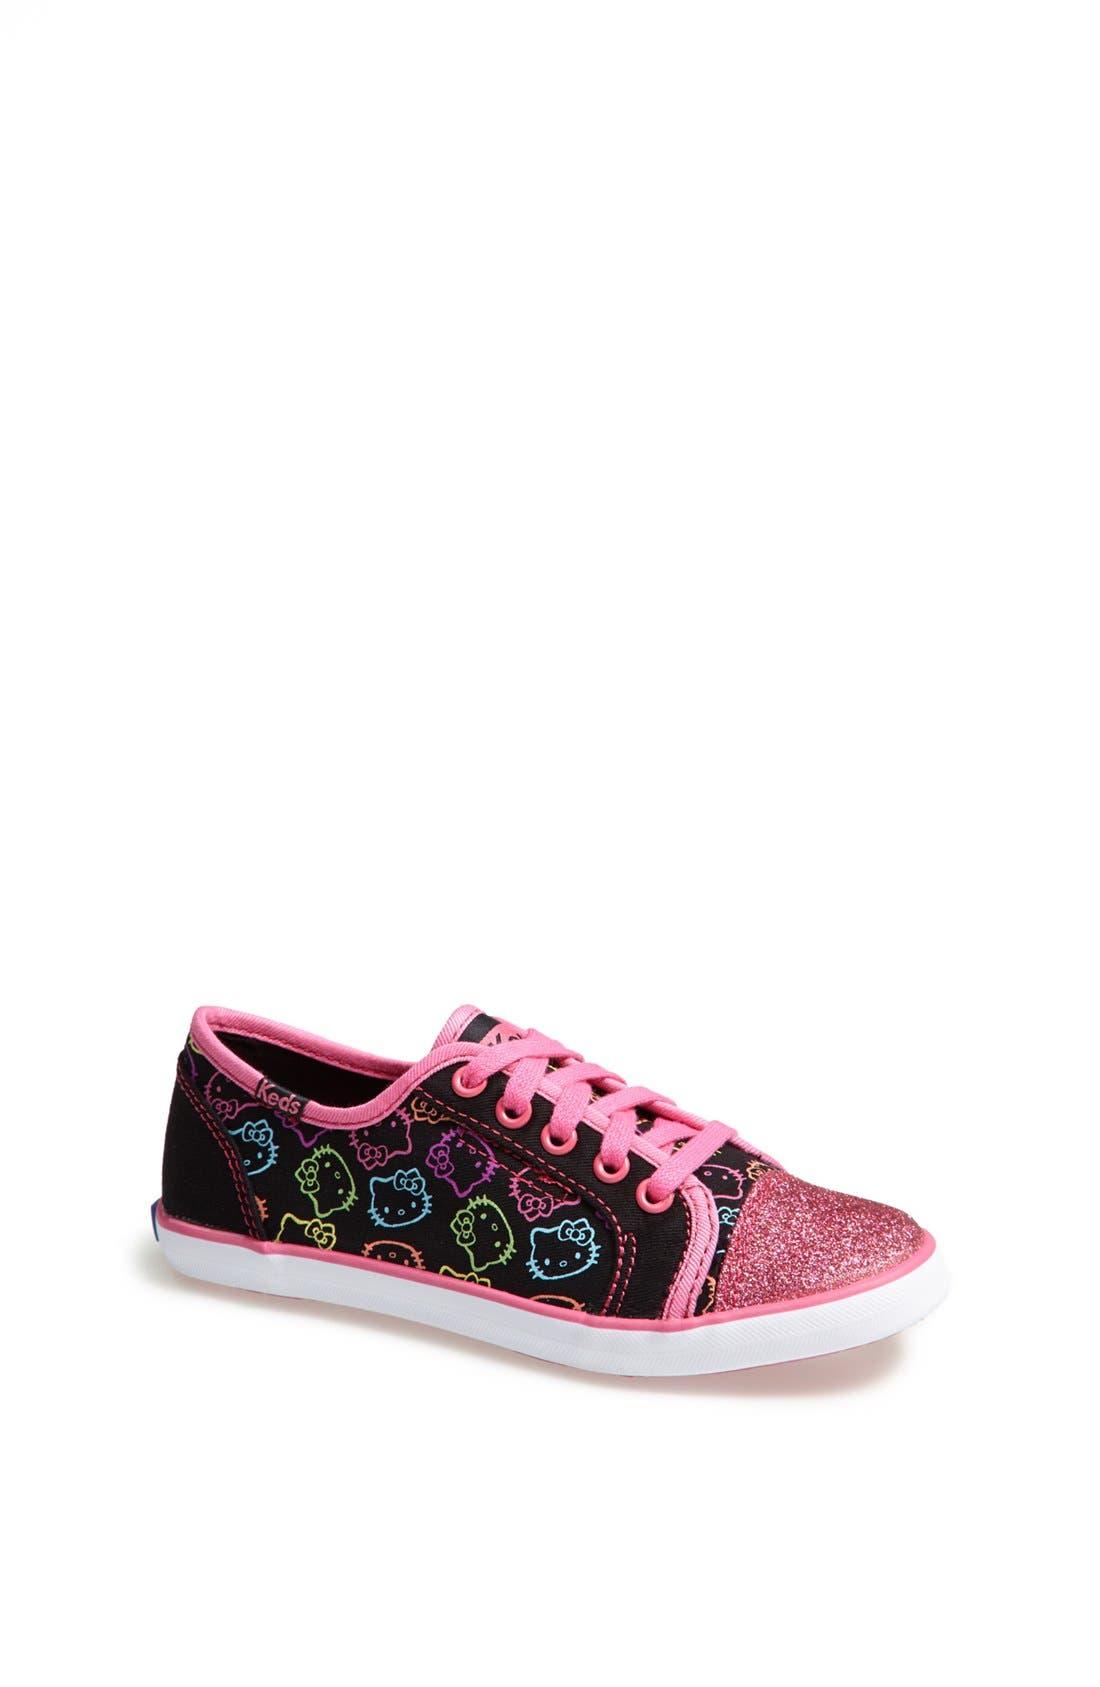 Alternate Image 1 Selected - Keds 'Hello Kitty® - Rally' Sneaker (Toddler, Little Kid & Big Kid)